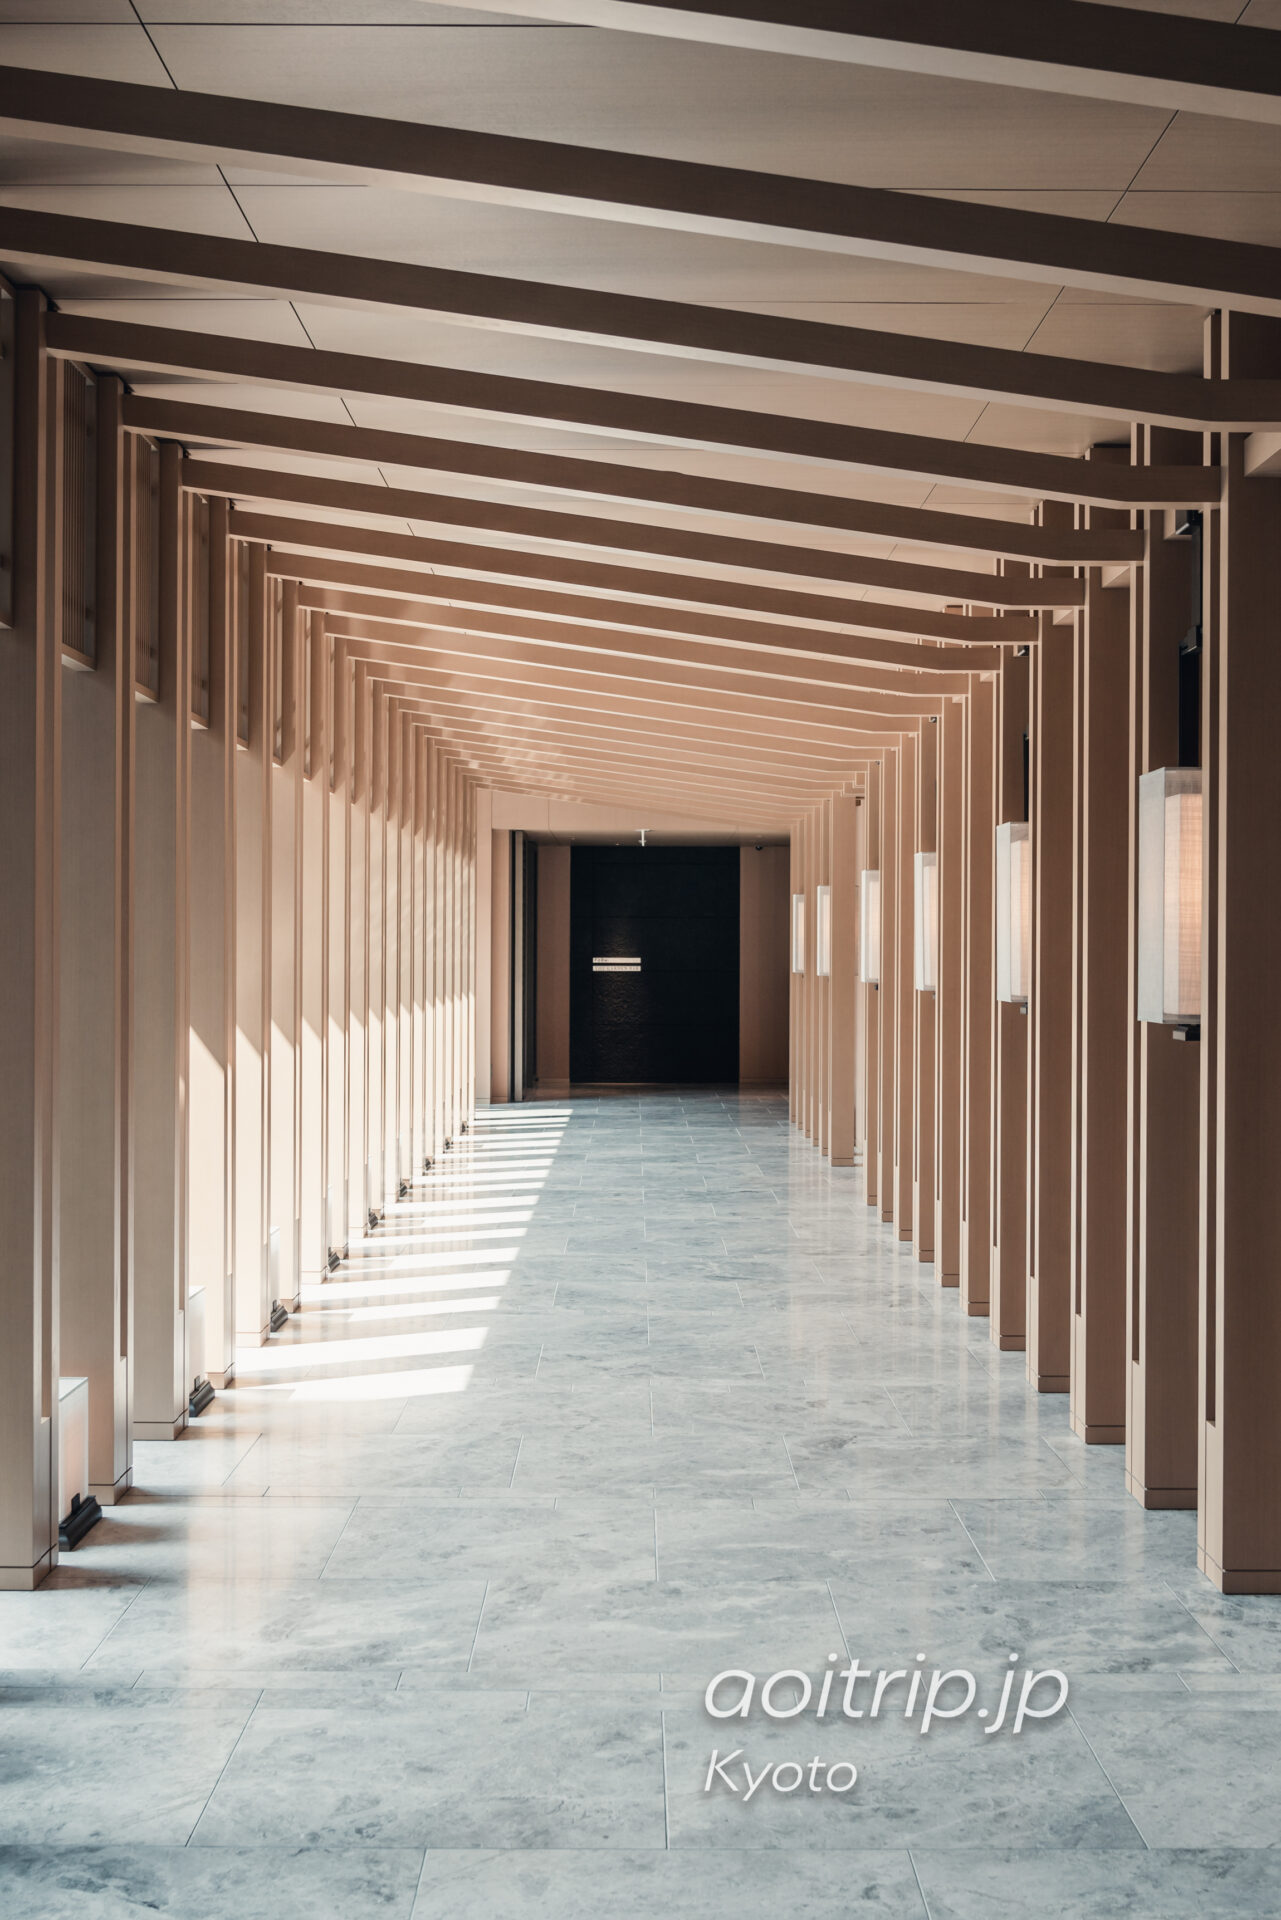 HOTEL THE MITSUI KYOTO 千本鳥居からインスピレーションを得た通路